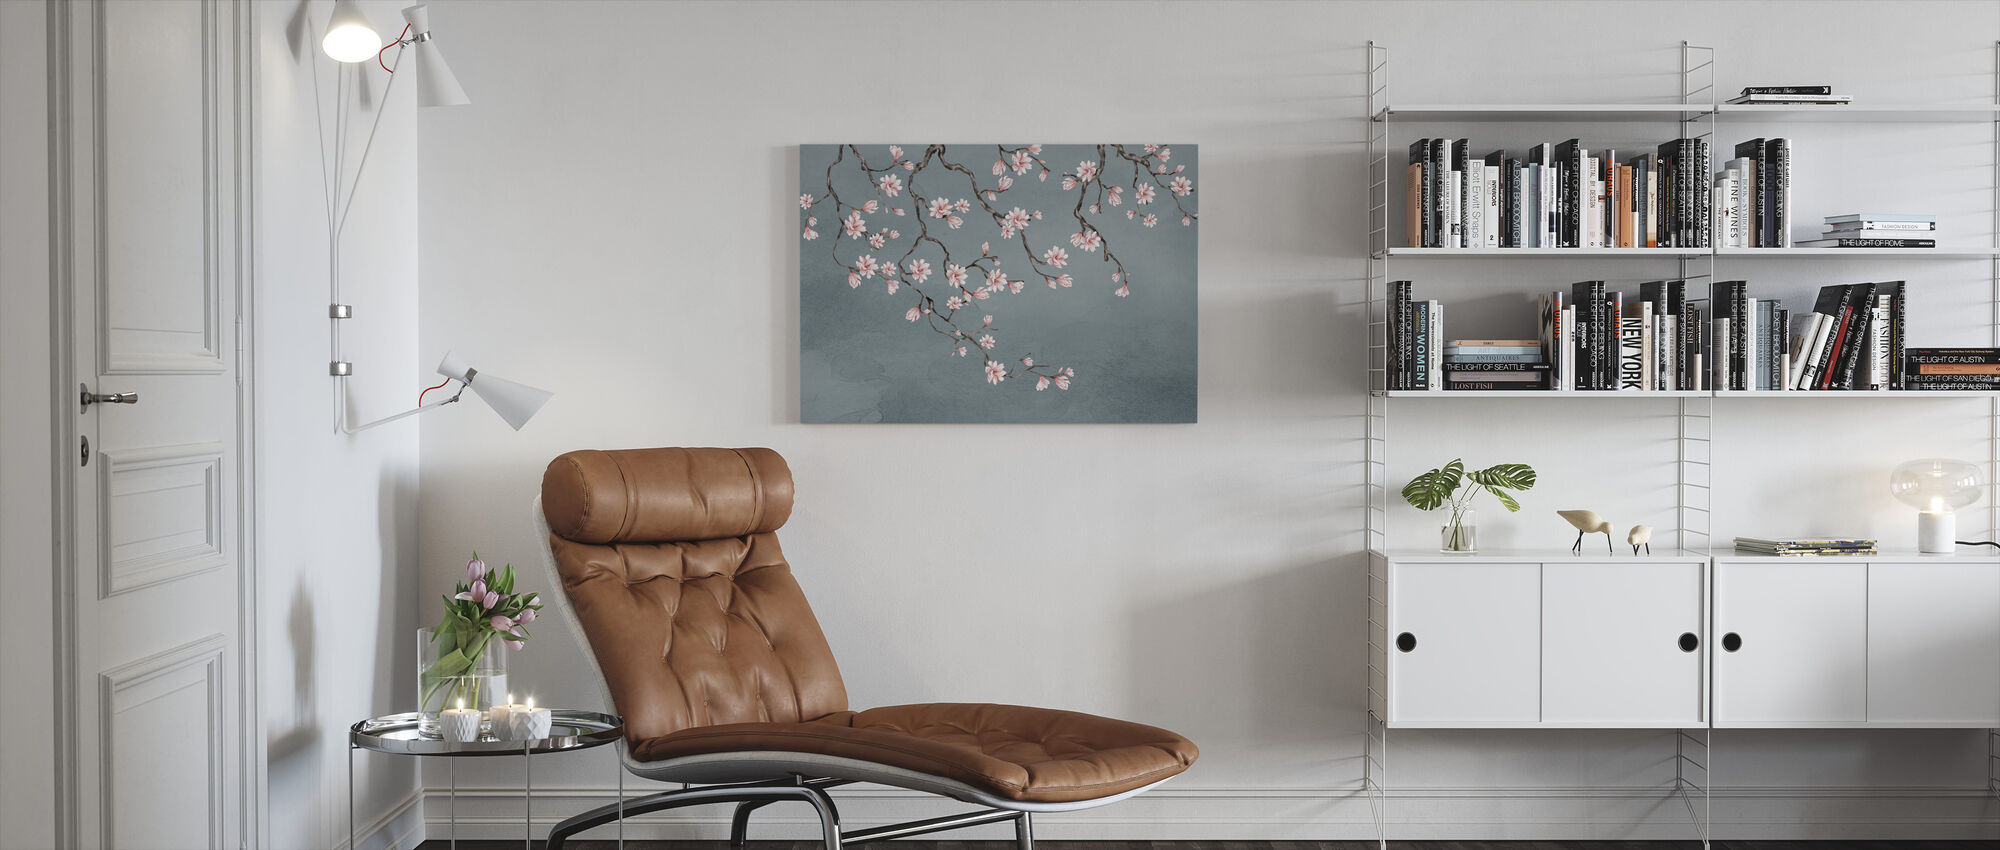 Floraison grener - Lerretsbilde - Stue